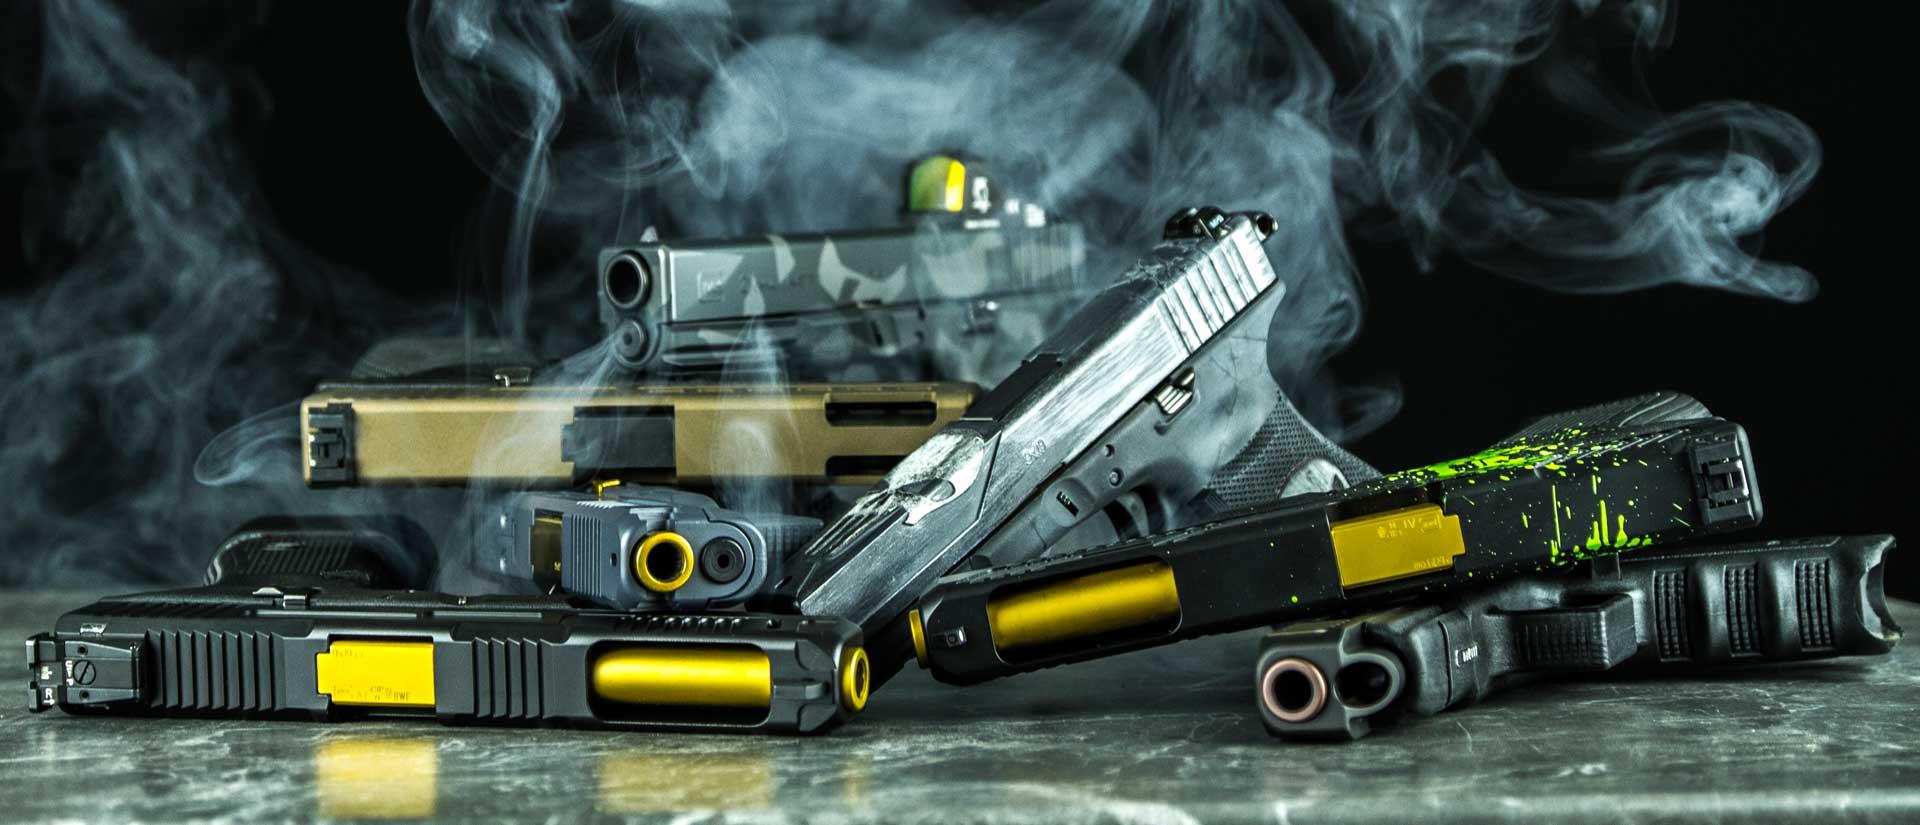 verex-tactical-tuning-waffen-pistole-glock-sig-sauer-17-cz-walther-visier-bruenieren-ar15-red-dot-beschichtung-tuning-cerakote-stippling-griptech-salzburg-slider-04